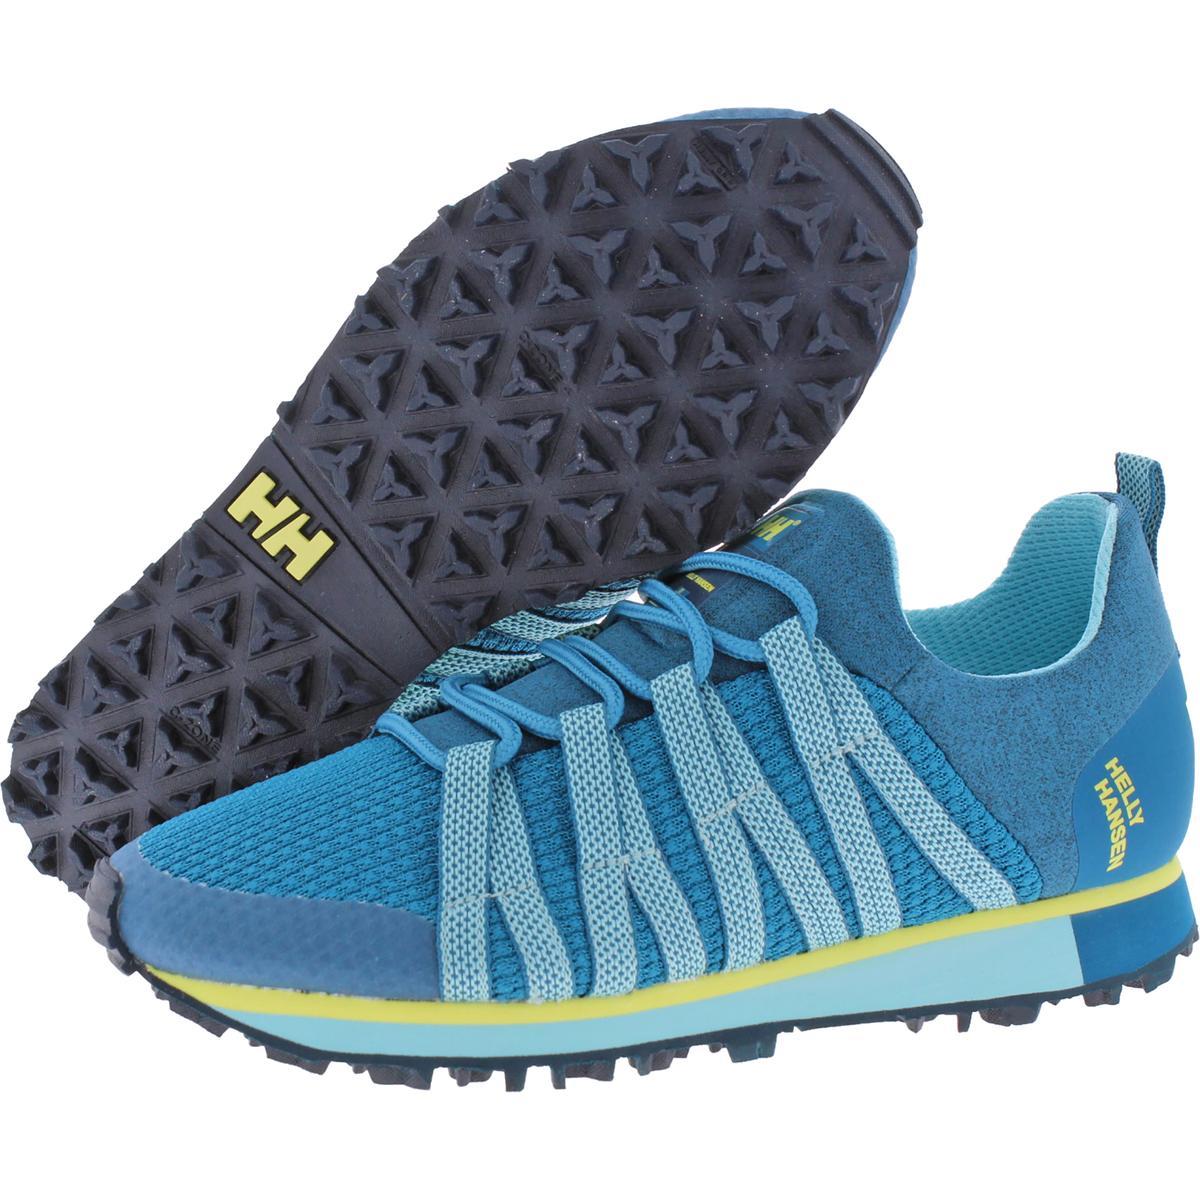 thumbnail 8 - Helly-Hansen-Womens-Vardapeak-V2-Fitness-Performance-Sneakers-Shoes-BHFO-9846